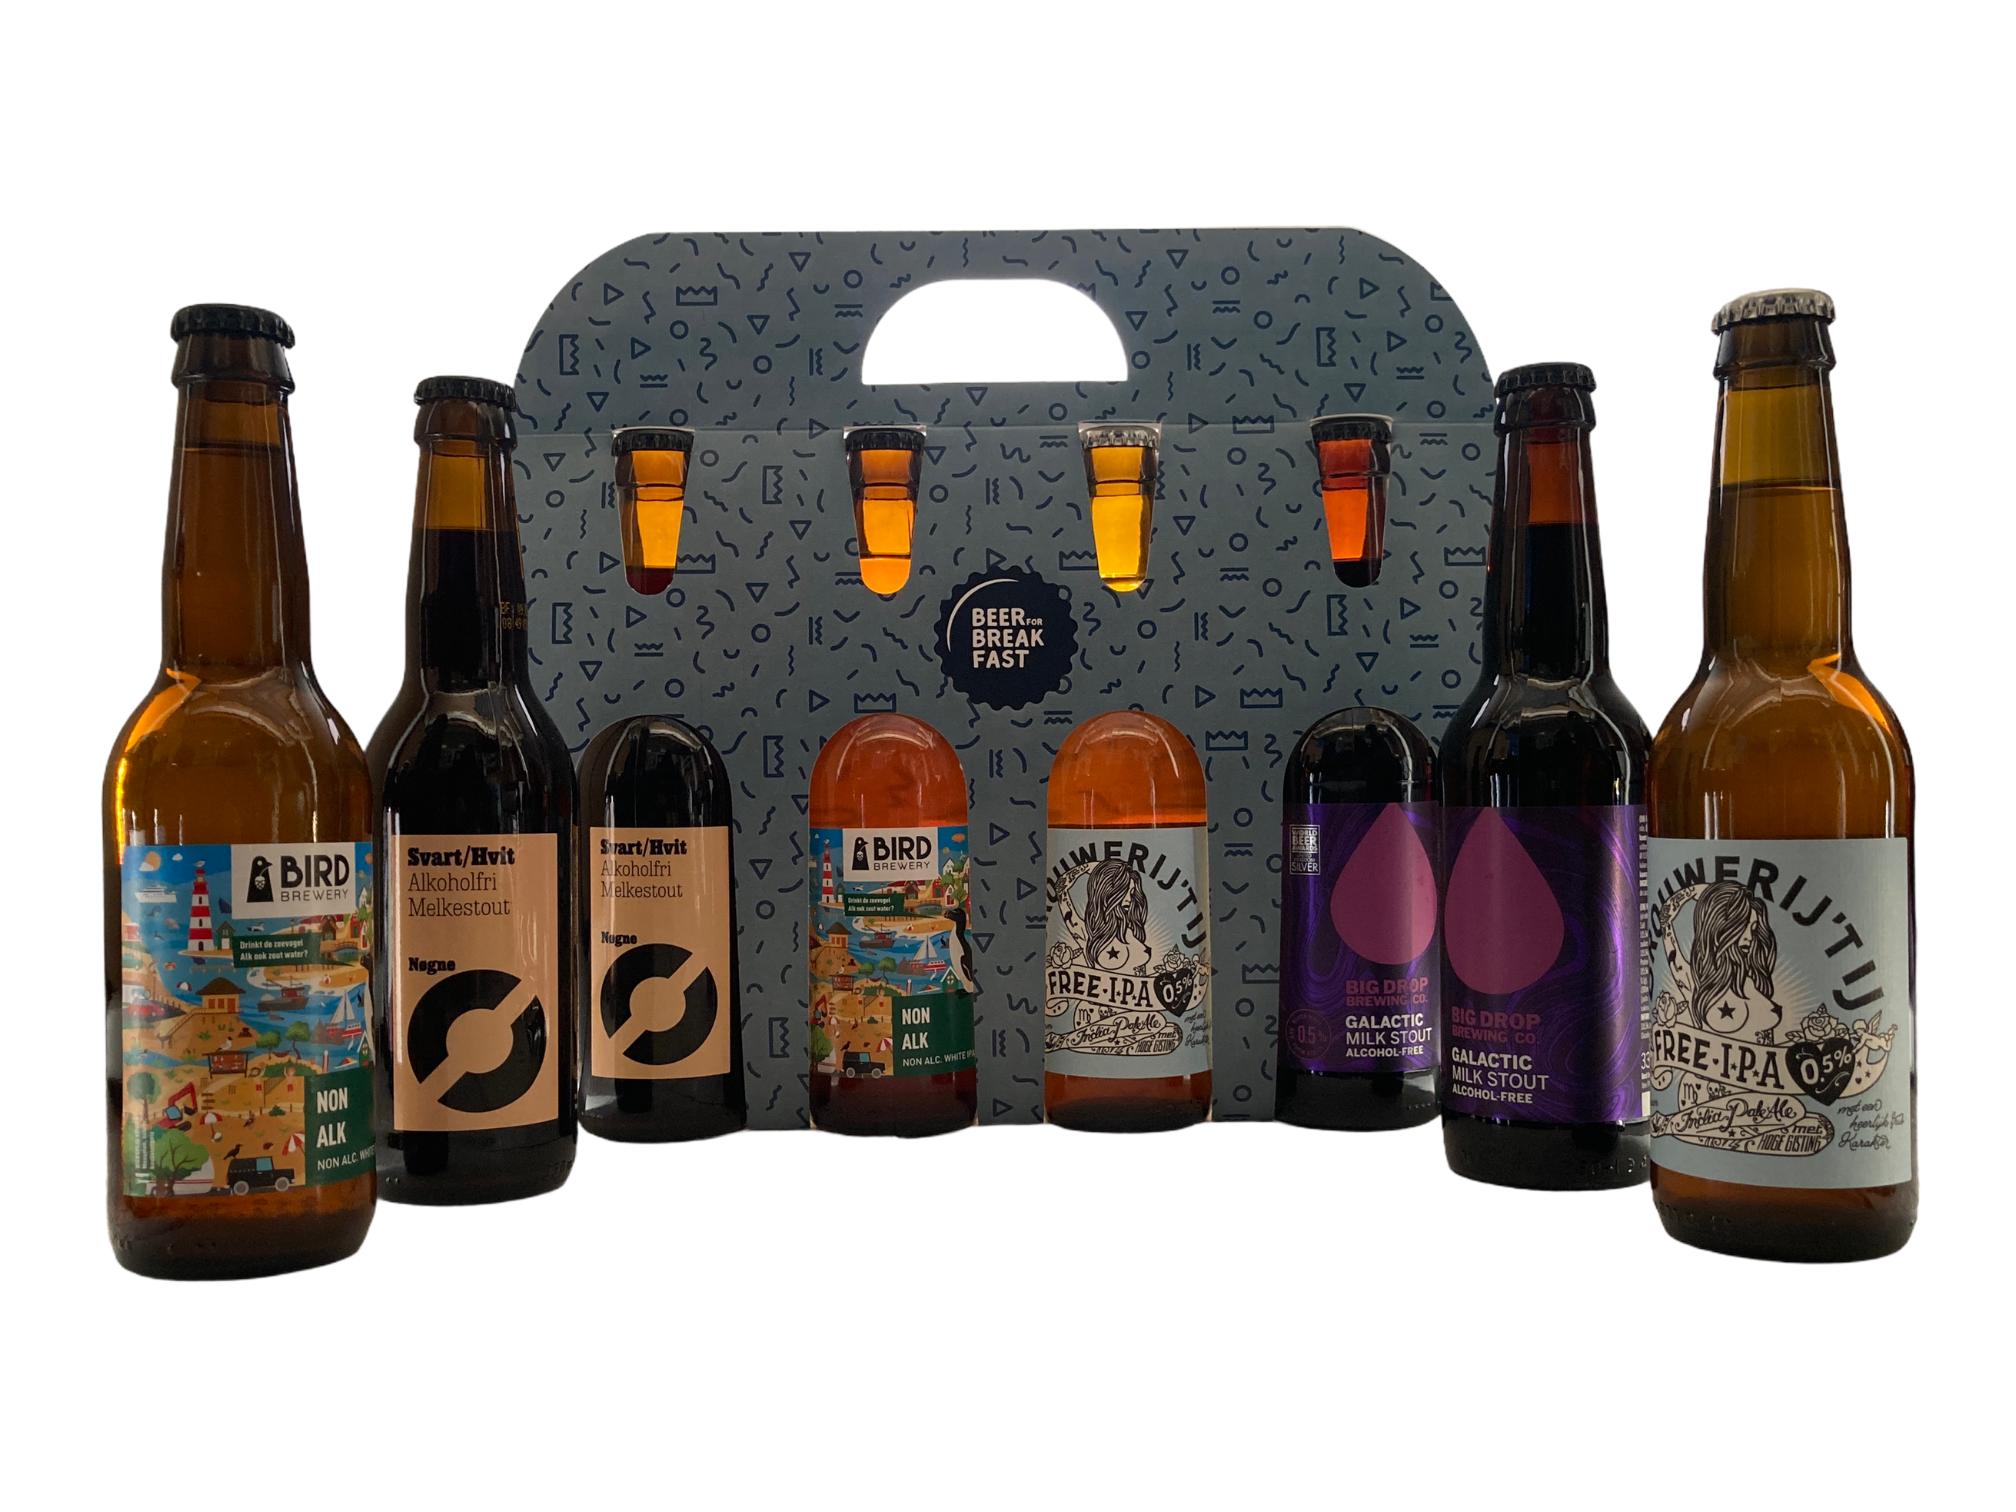 No Alcohol Bierpakket-1